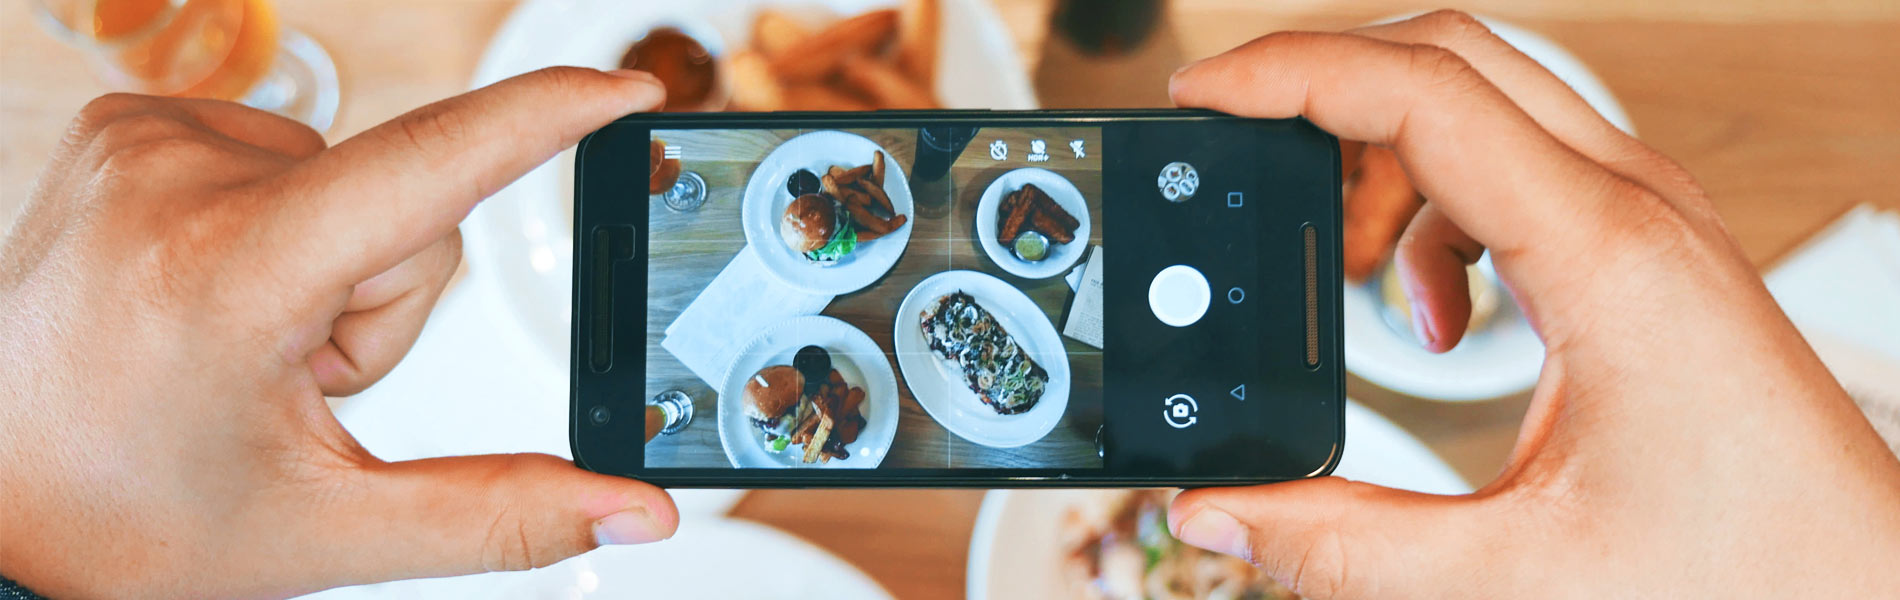 food sharing